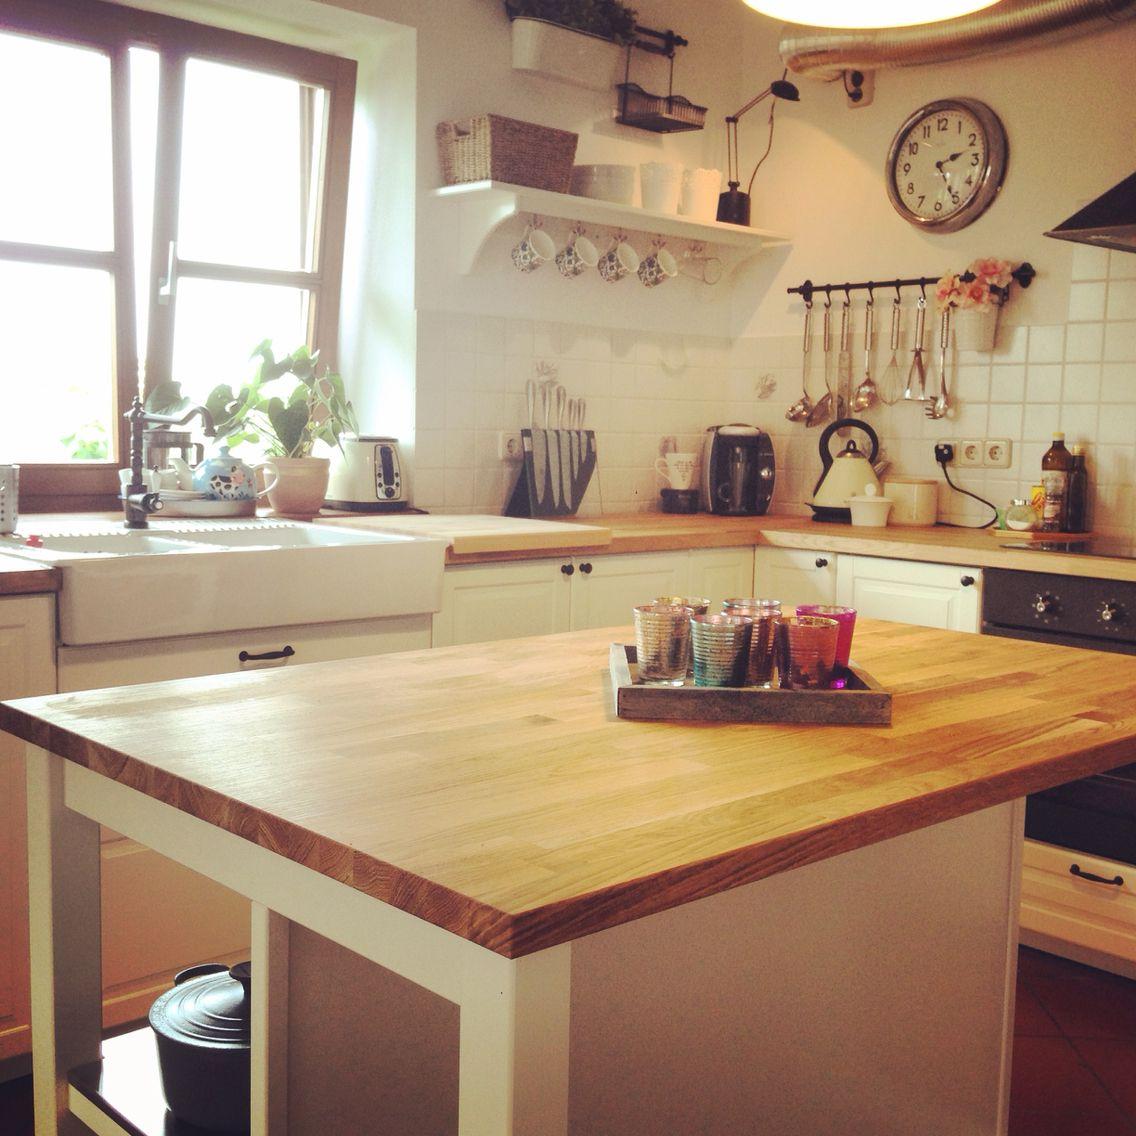 Ikea shaker style BODBYN kitchen | Kitchen | Pinterest | Küche